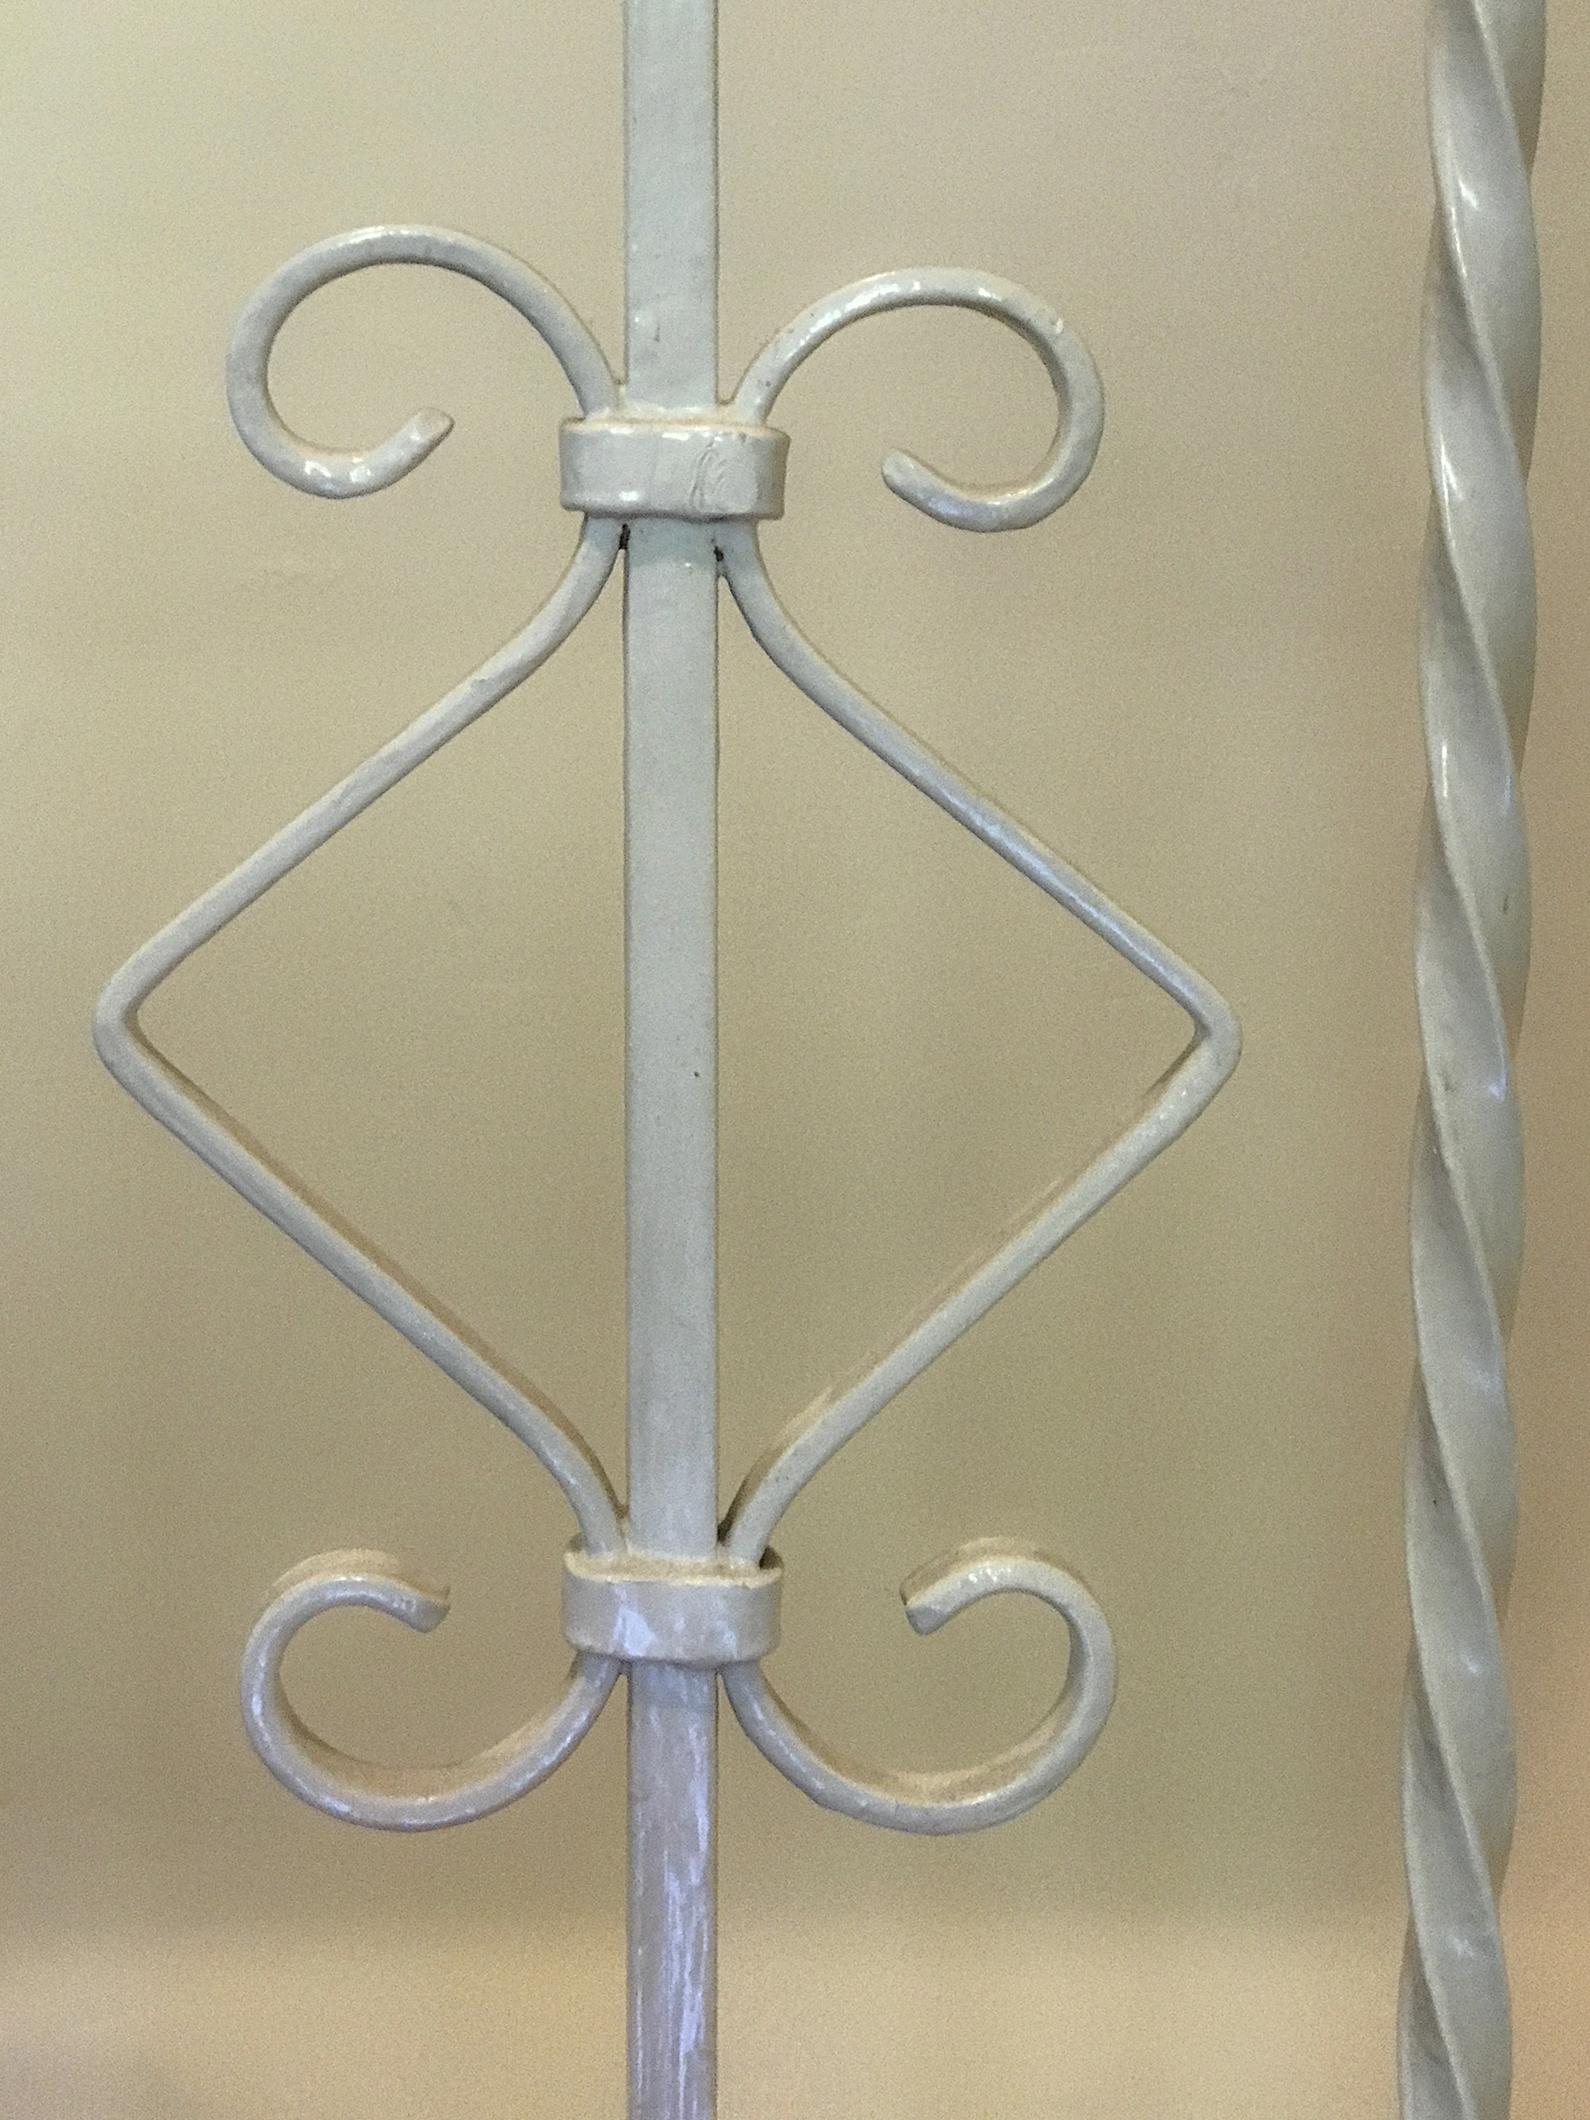 11th, railing detail.jpg